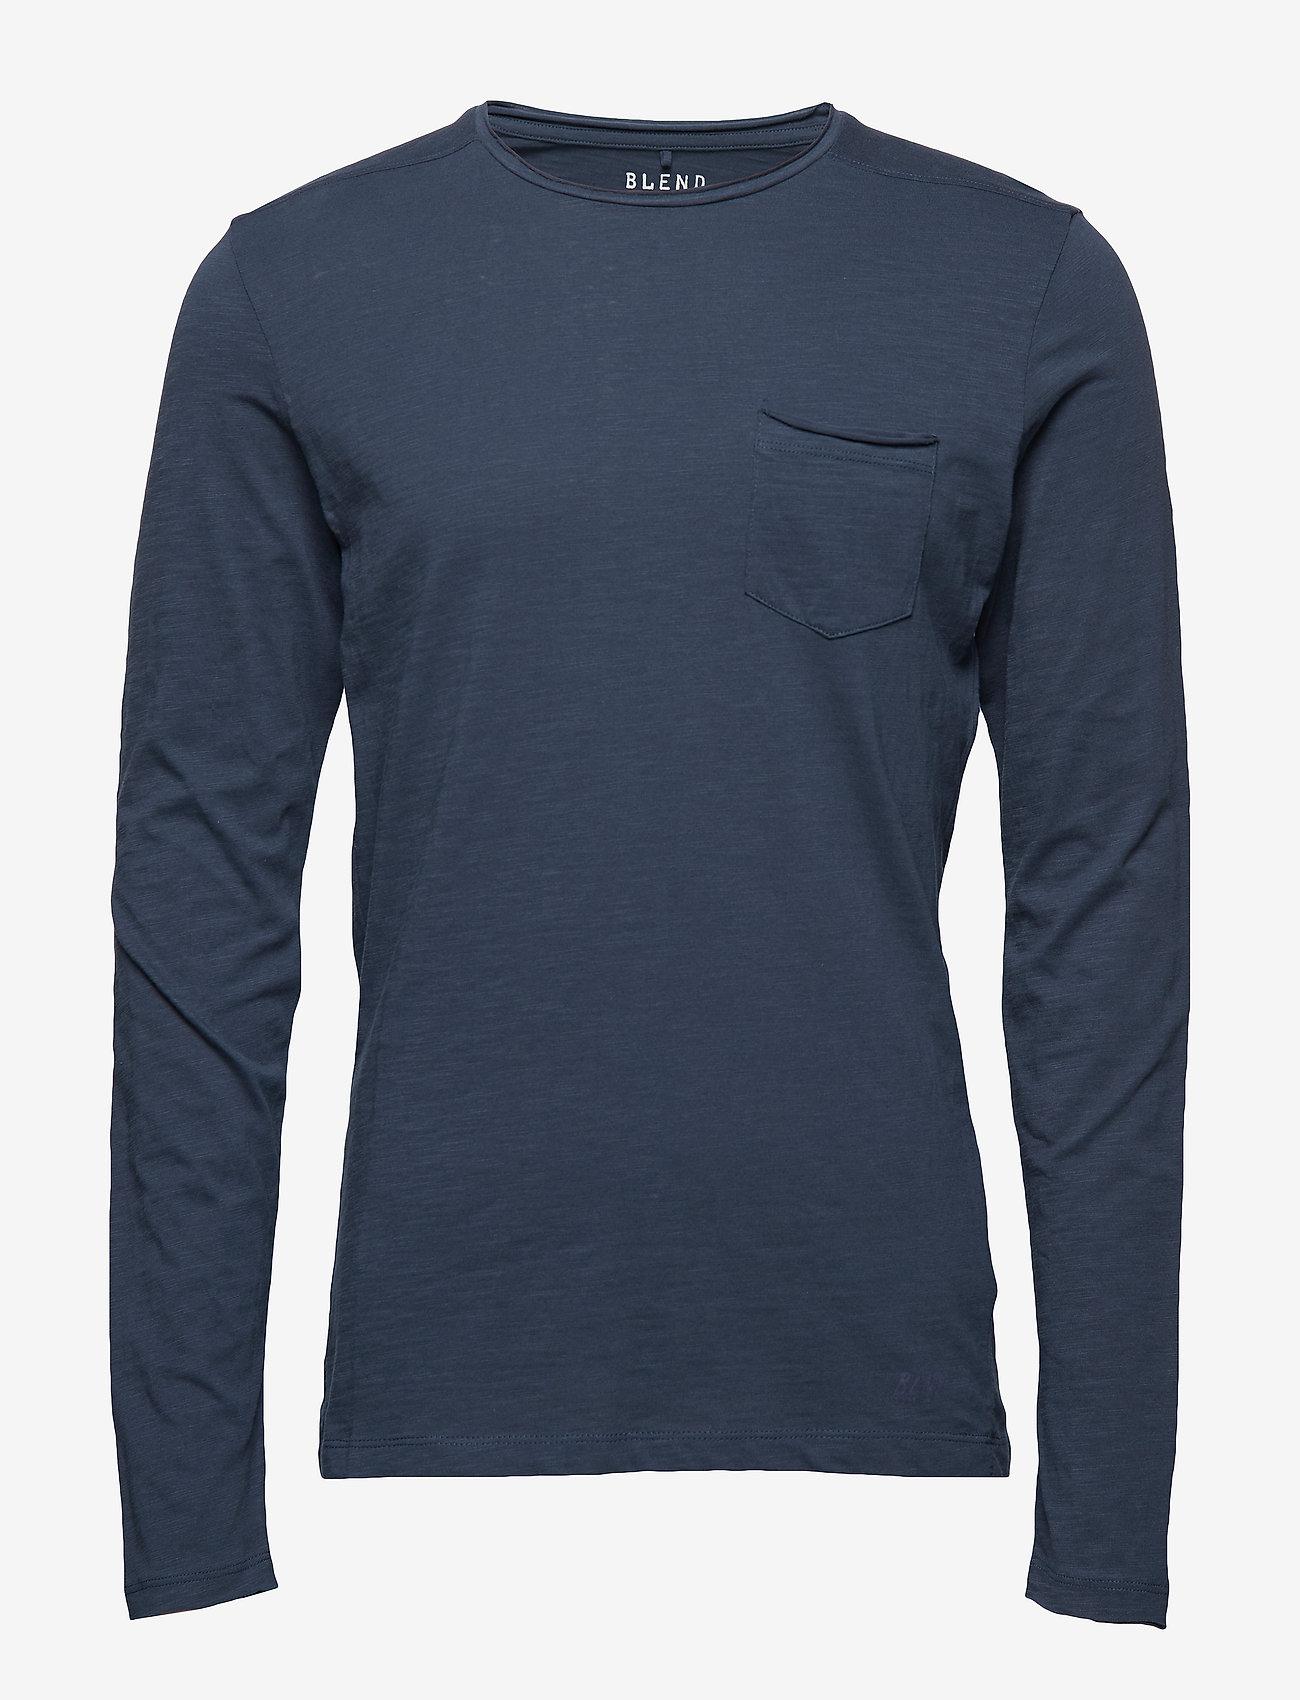 Blend - BHNICOLAI tee l.s. NOOS - basic t-shirts - midnight blue - 0